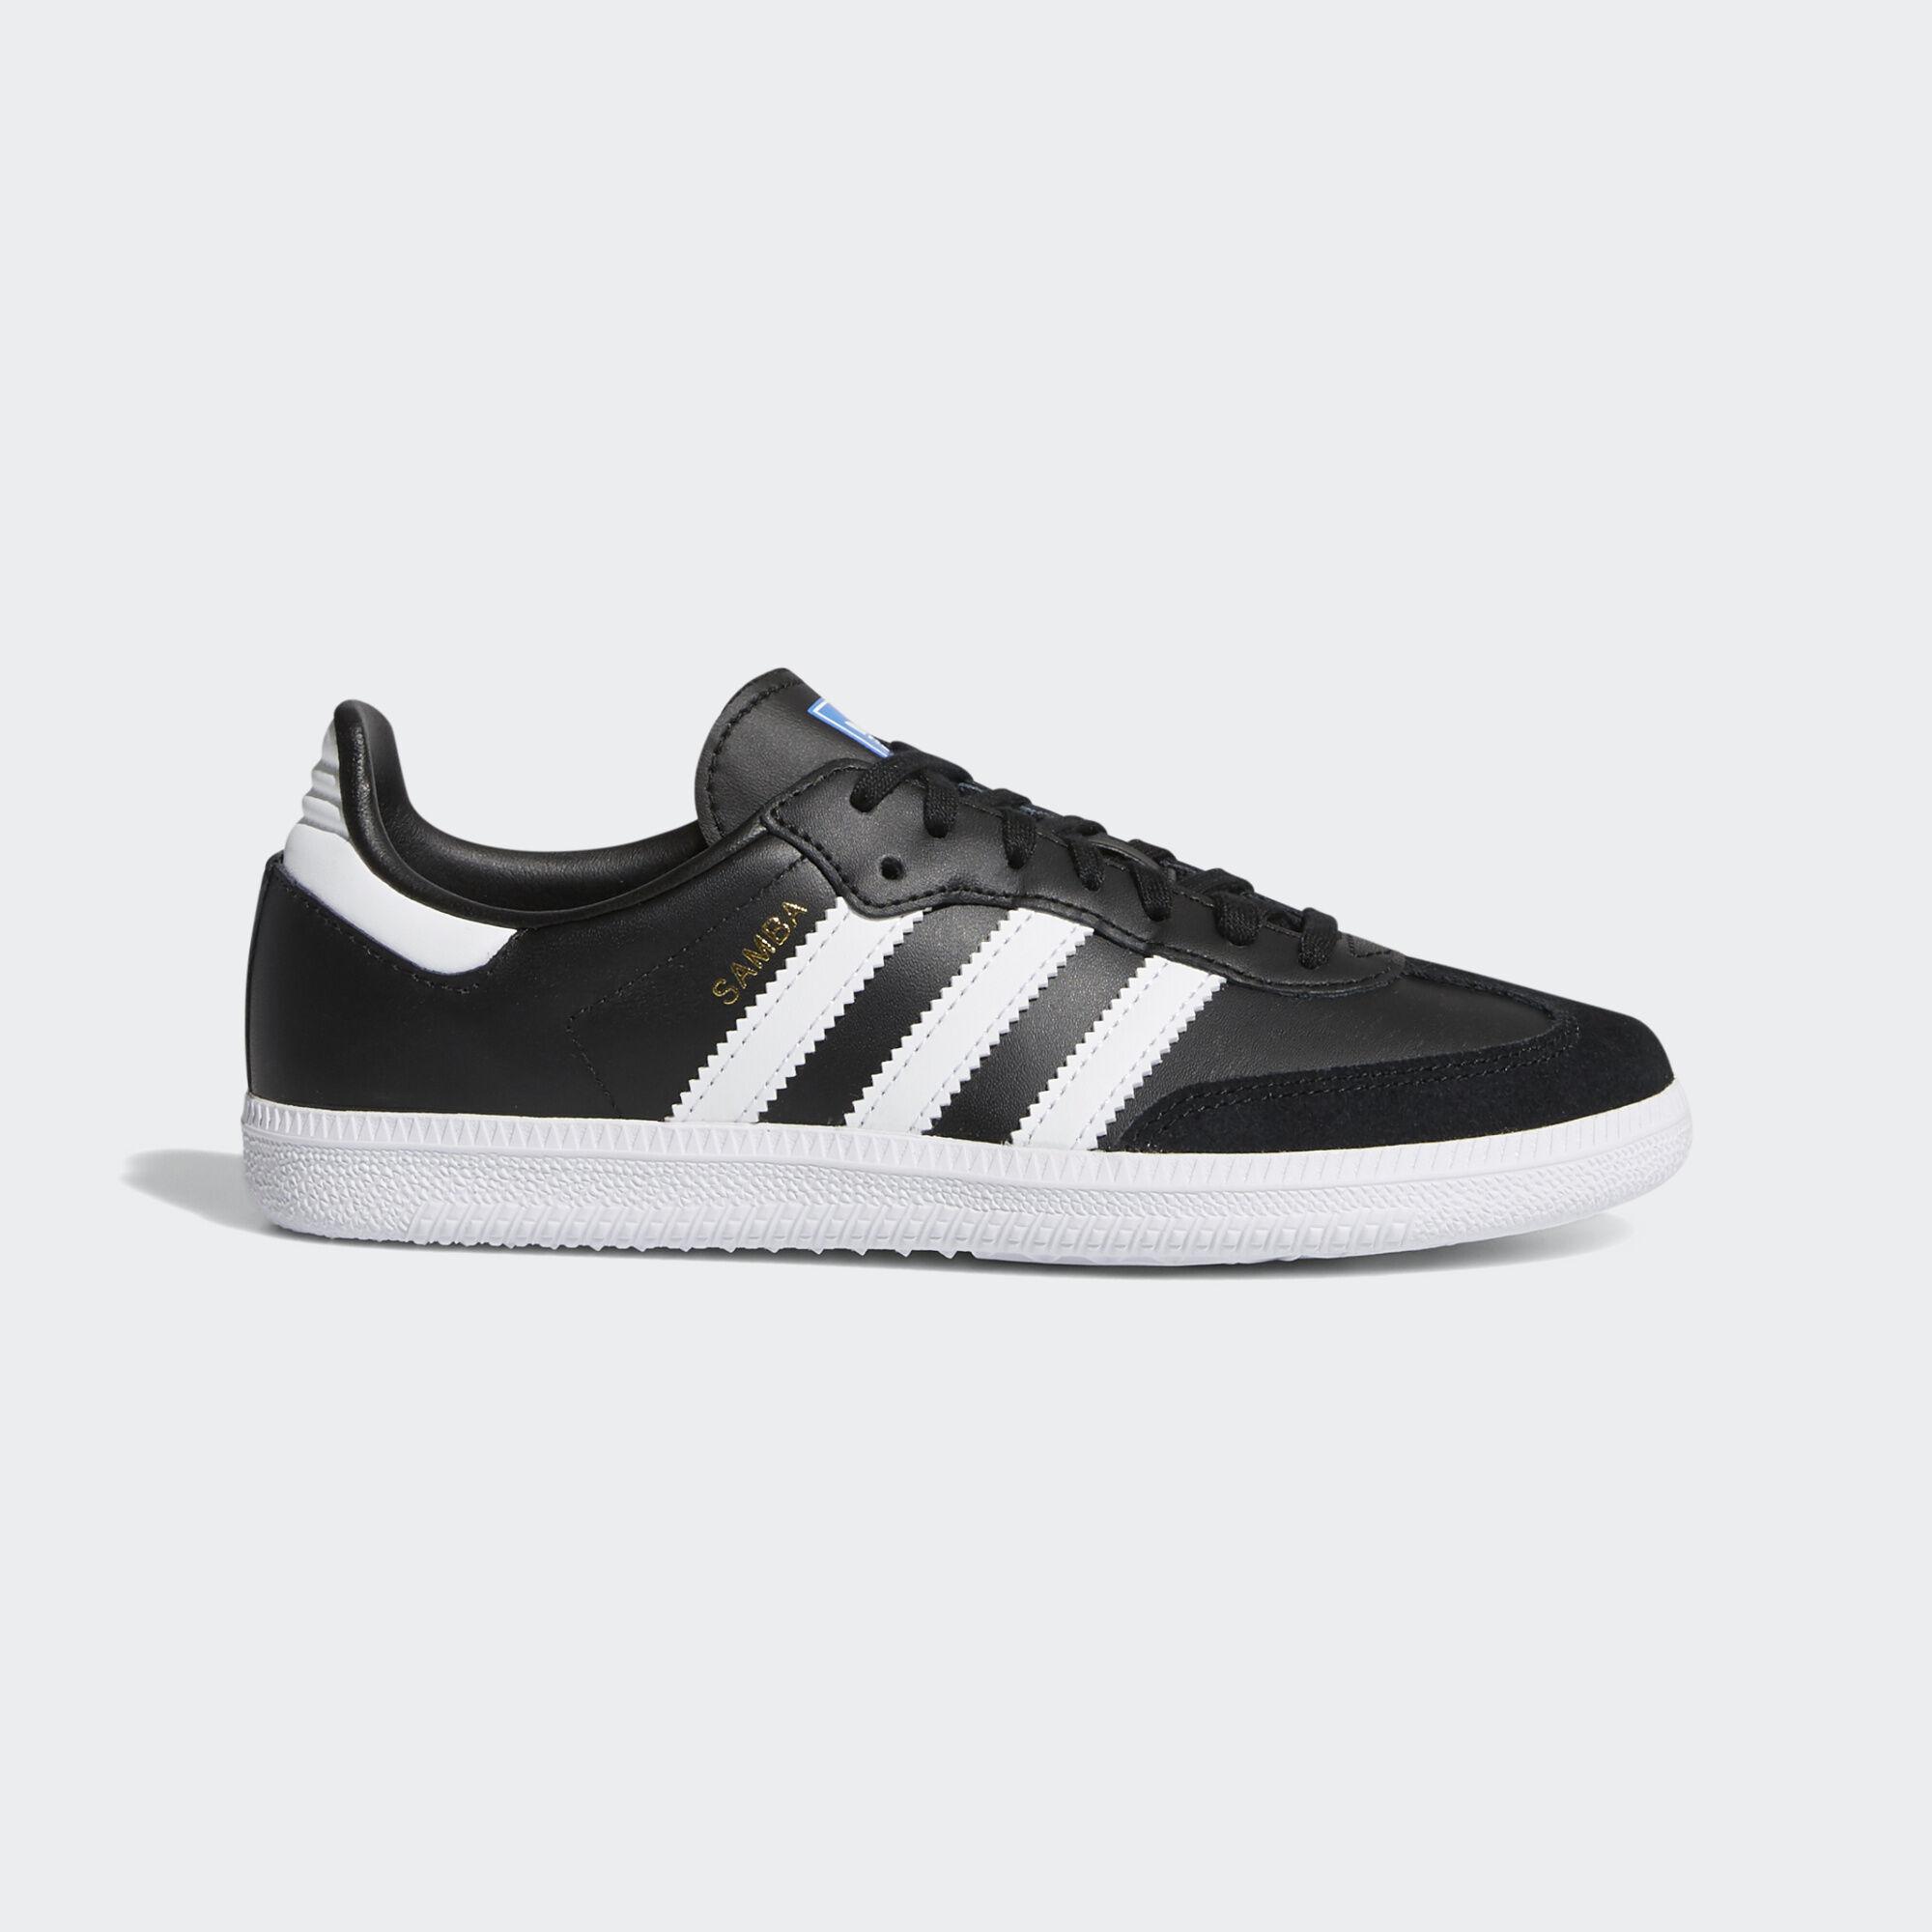 dcdebc5a9 First Adidas Shoes Made - Style Guru  Fashion